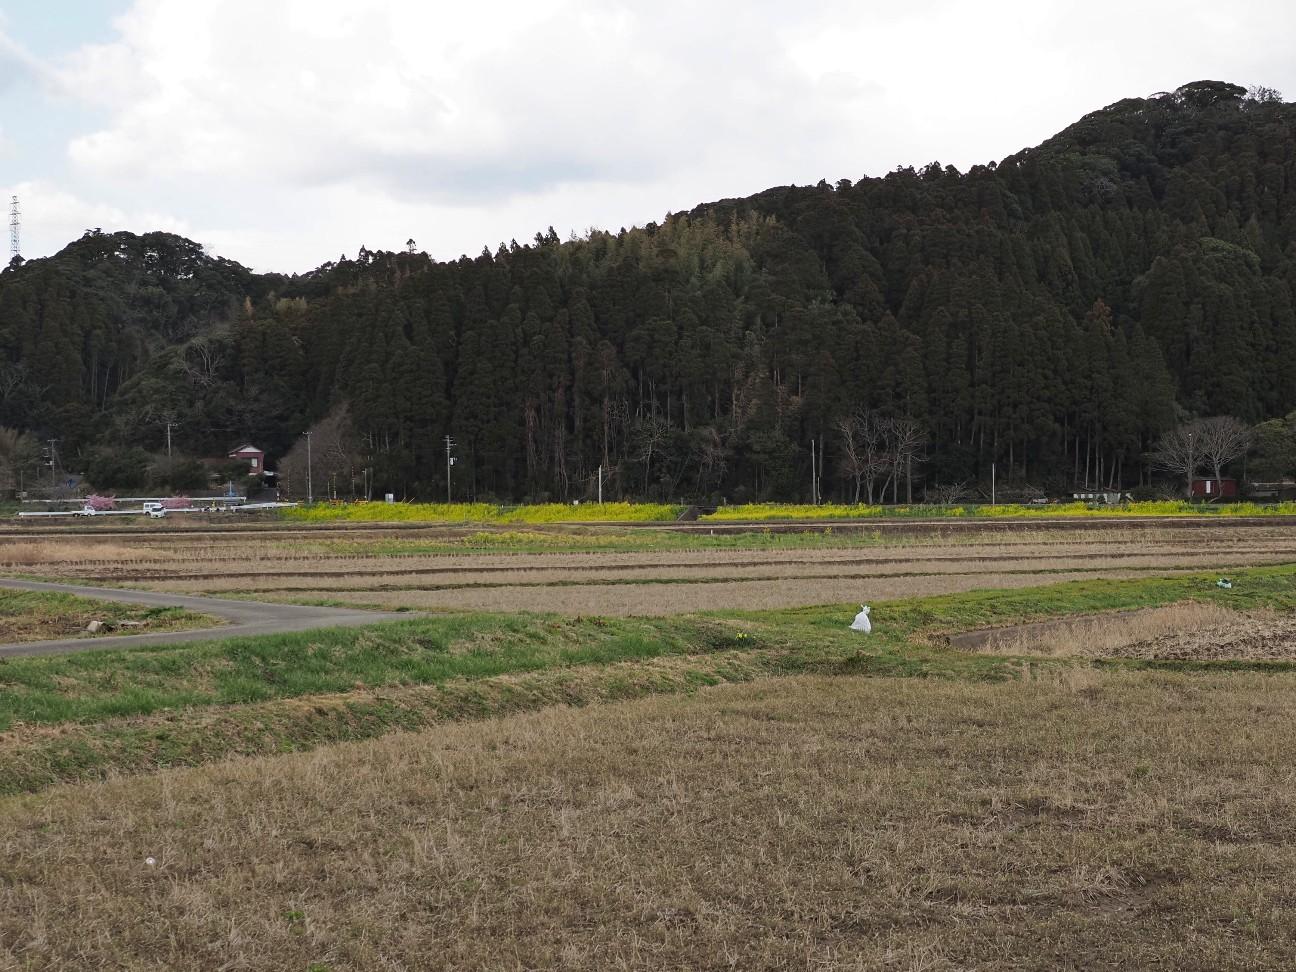 f:id:moriken-isumi:20200227133953j:image